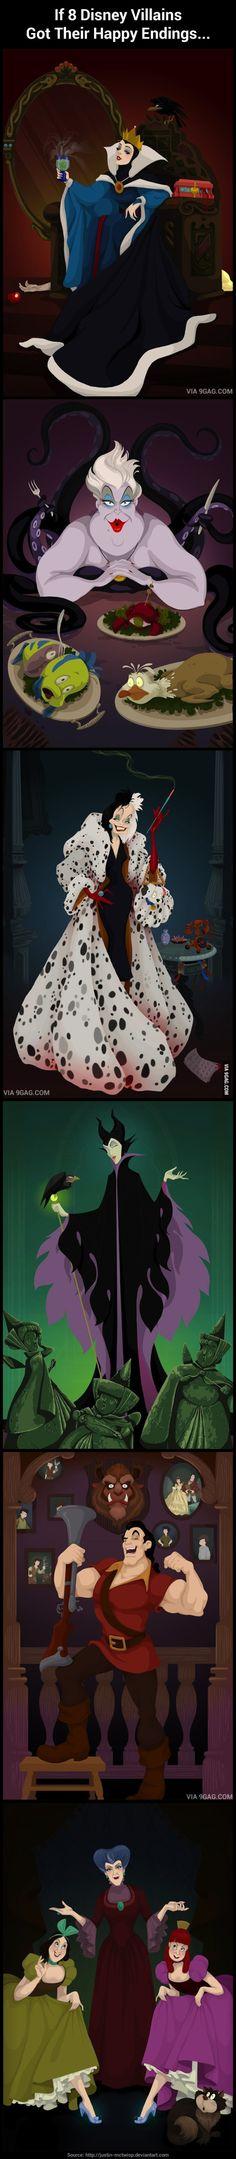 If 8 Disney Villains Got Their Happy Endings